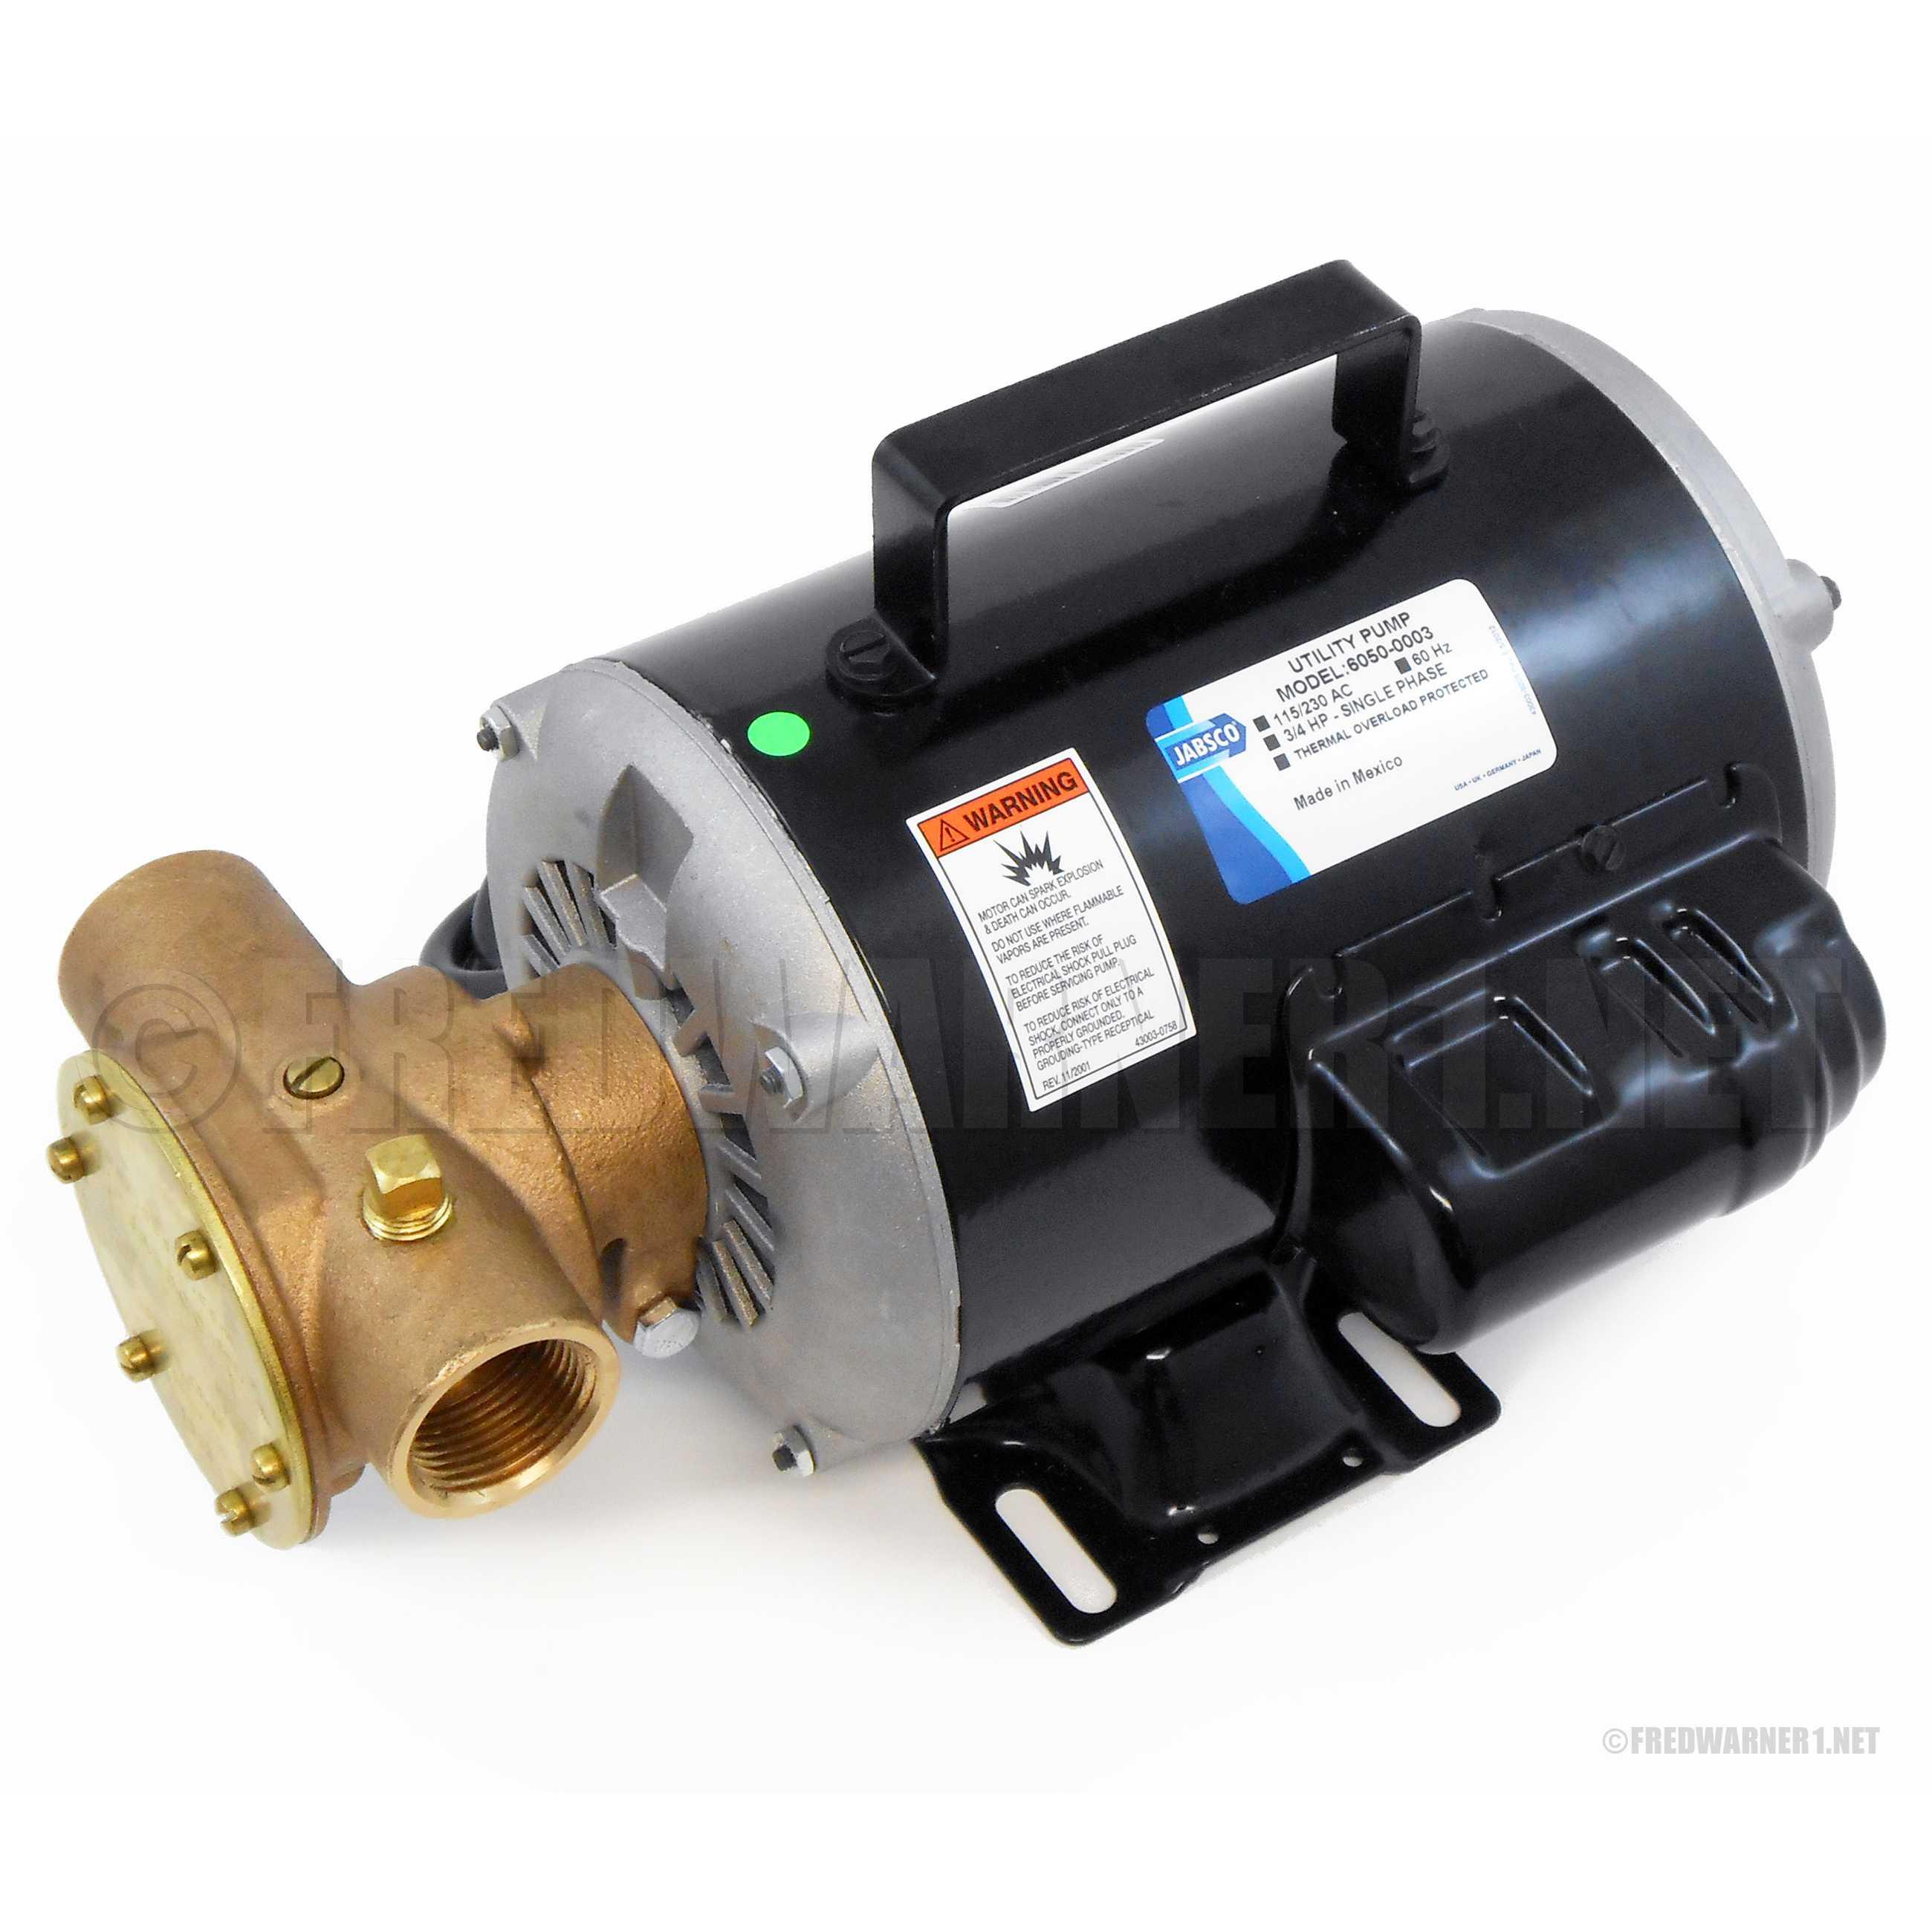 Jabsco 6050 0003 self priming utility pump 23 gpm 115v ac 1 npt us jabsco publicscrutiny Image collections